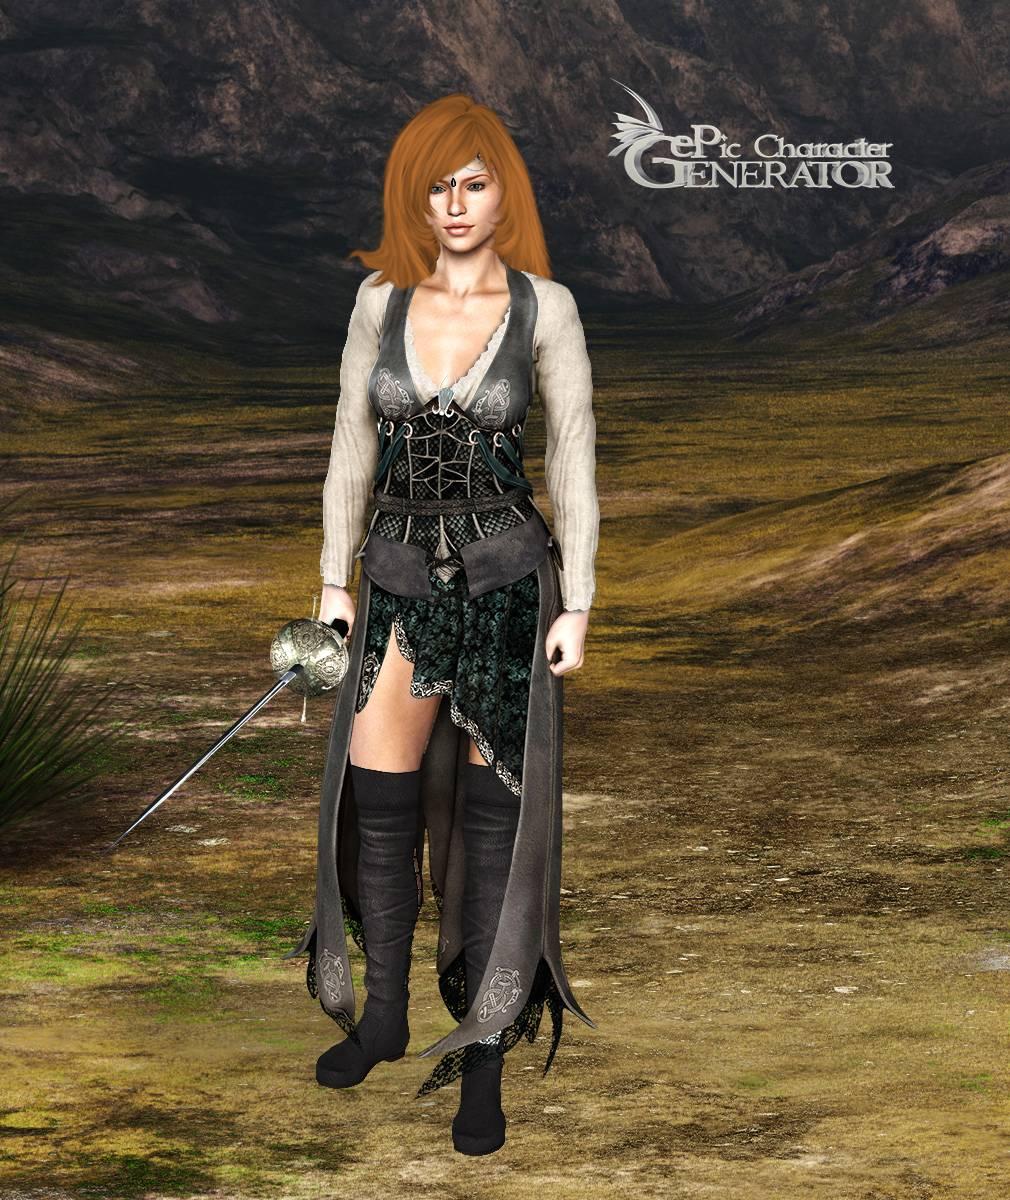 ePic Character Generator Season 2 Female Adventurer 2 Screenshot 02